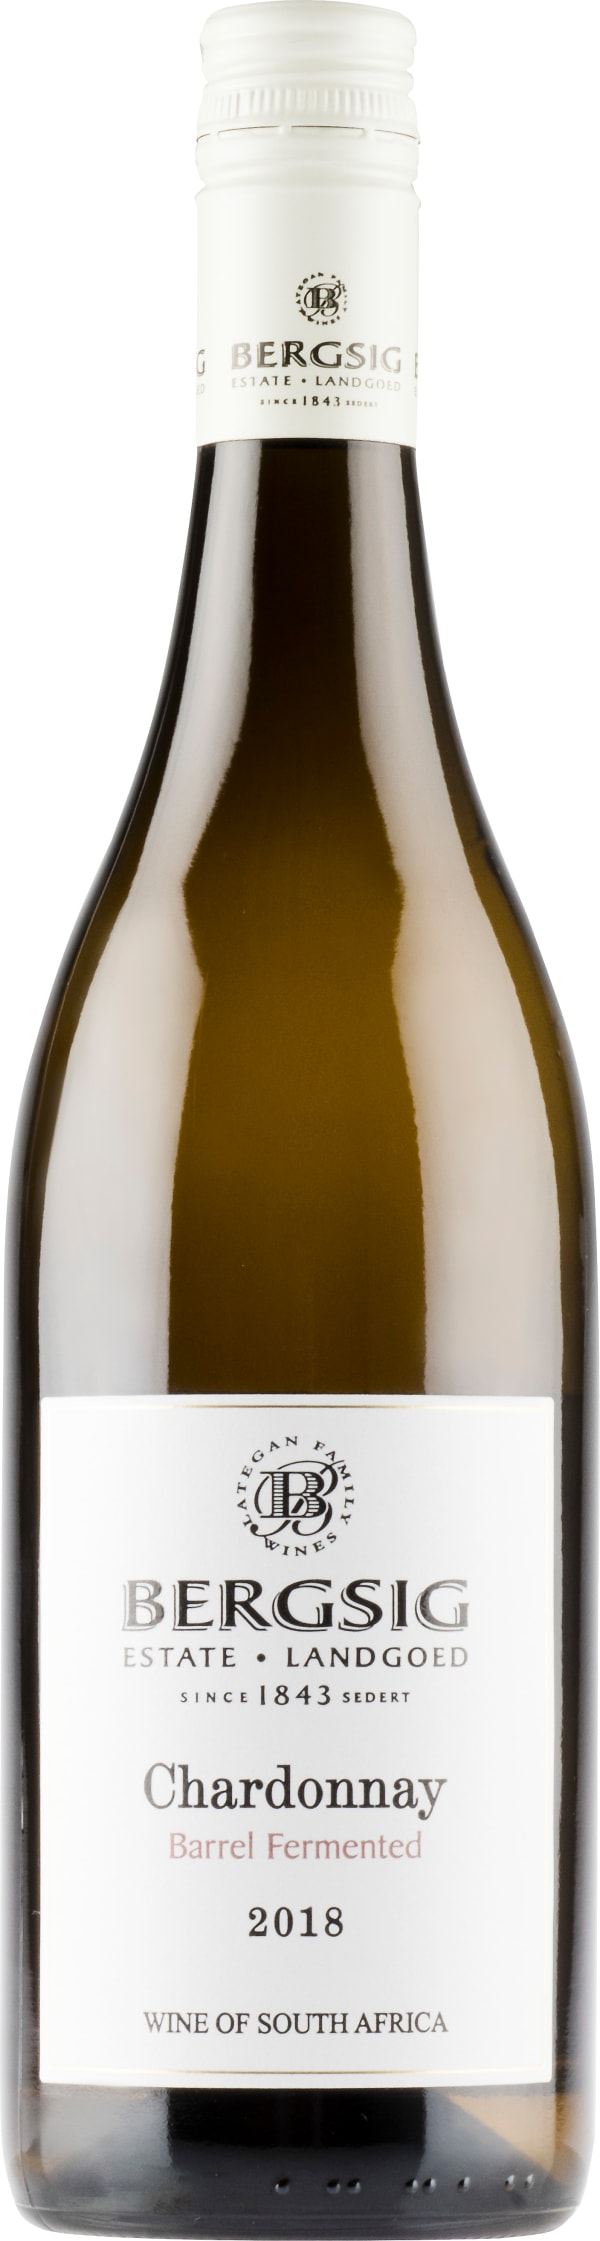 Bergsig Estate Barrel Fermented Chardonnay 2018